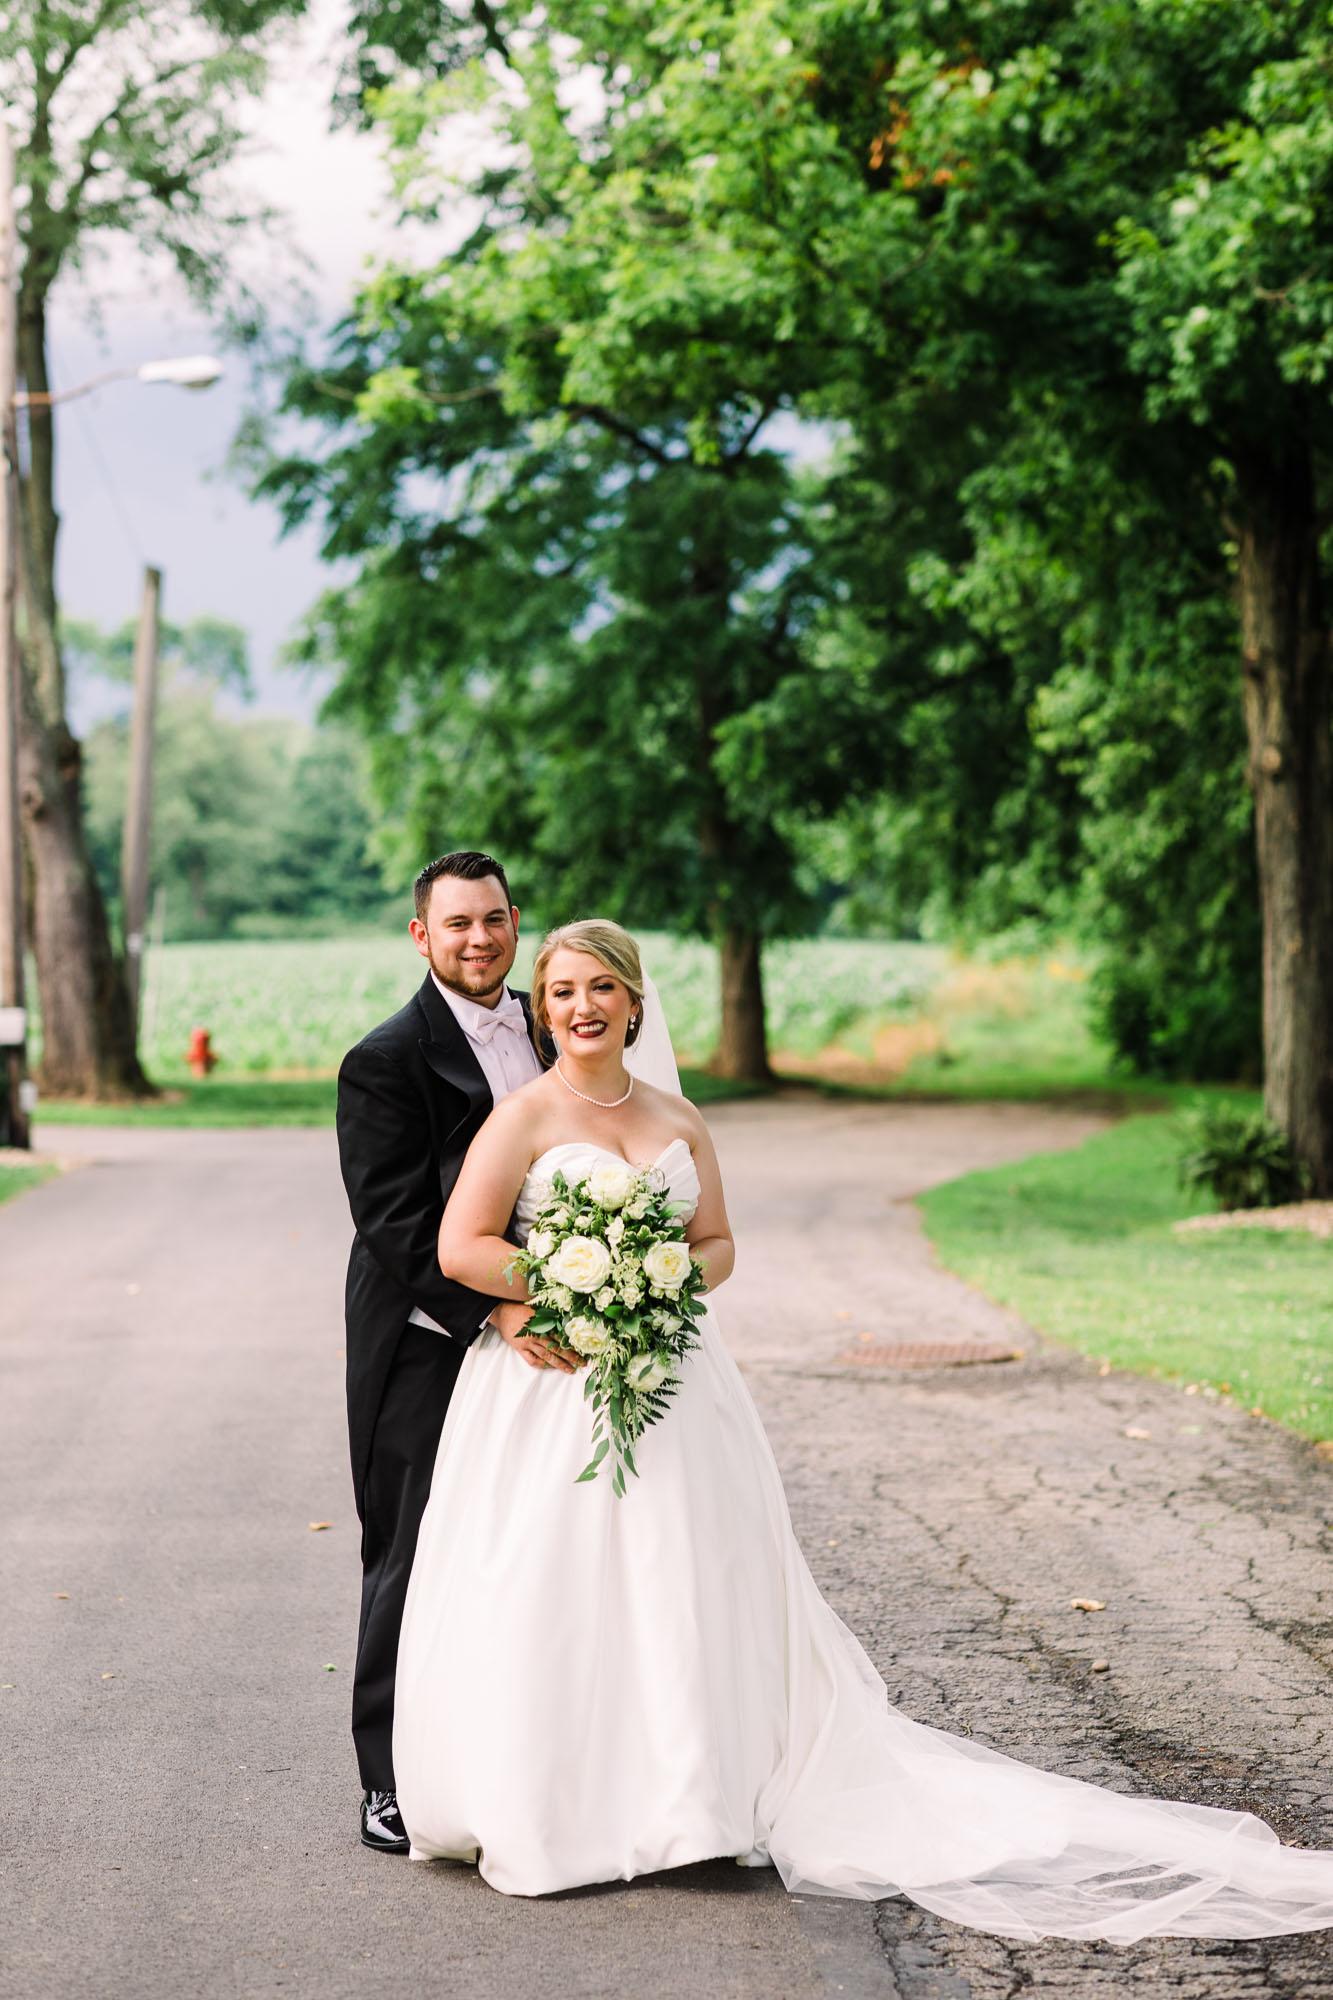 isle-of-que-wedding-4110.jpg